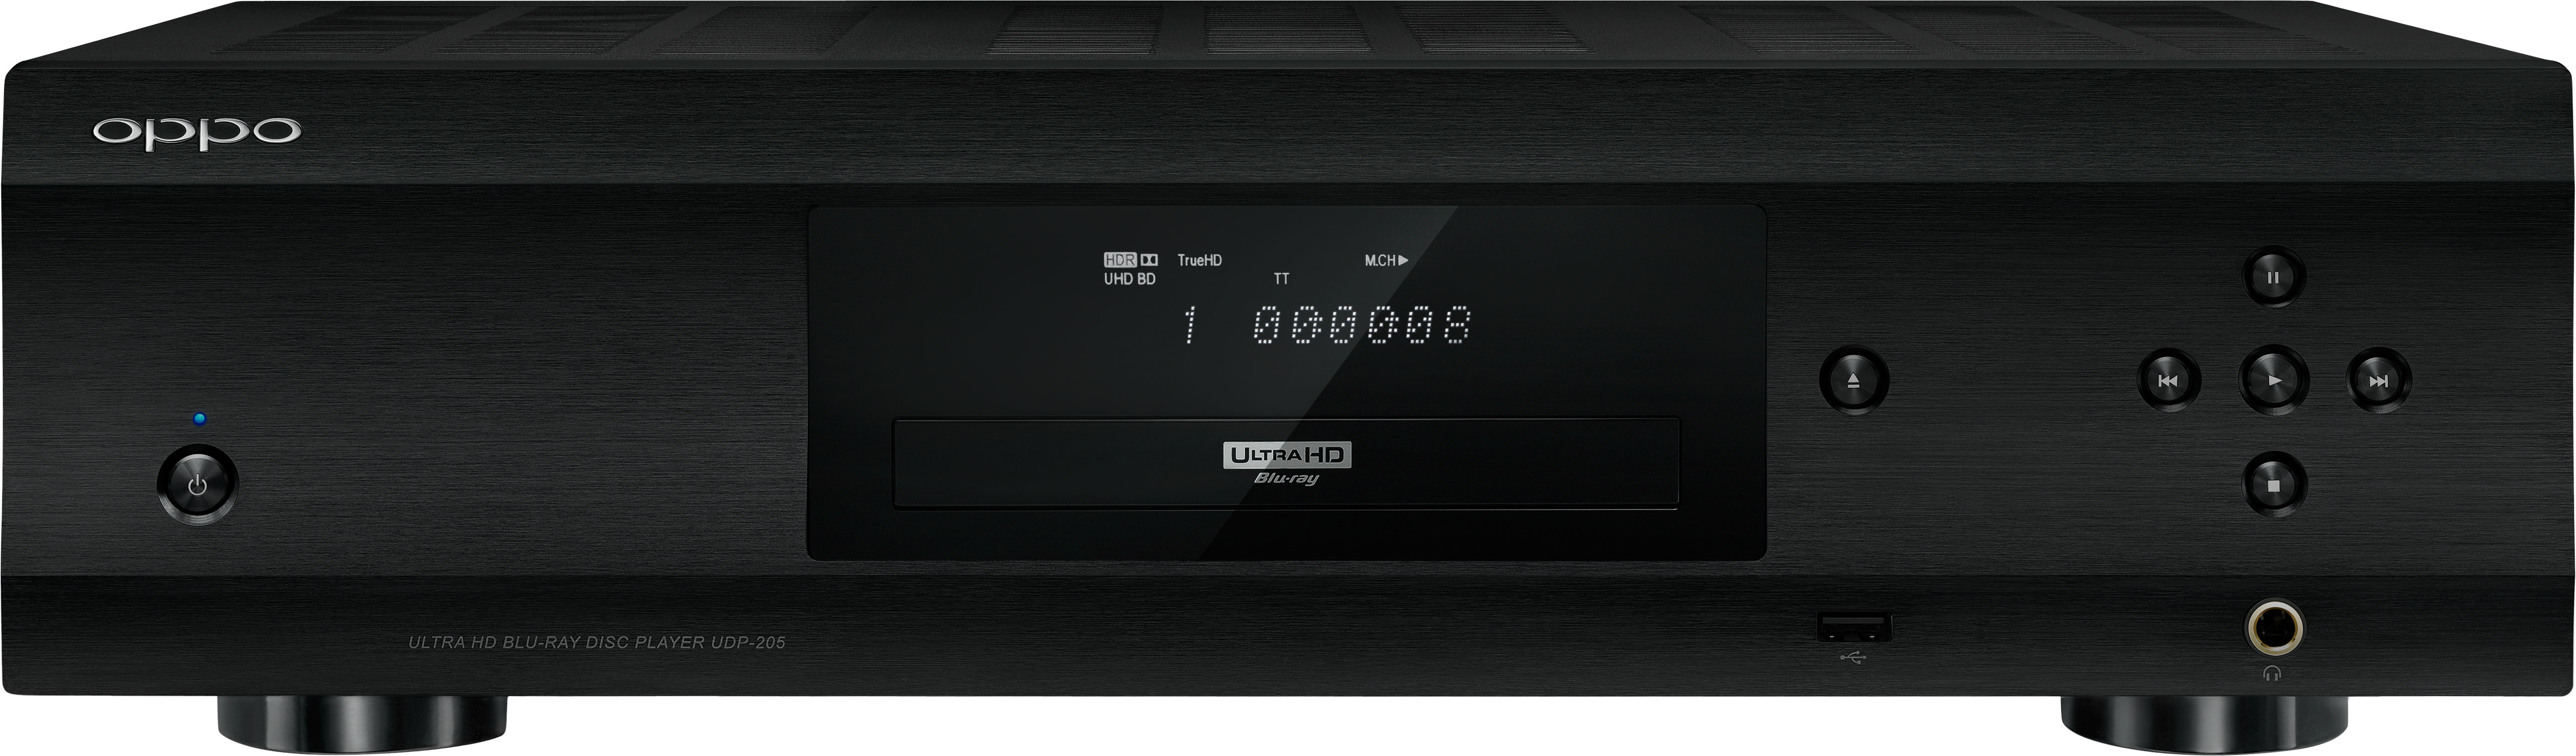 oppo digital udp 205 ultrahd blu ray player   blu ray forum